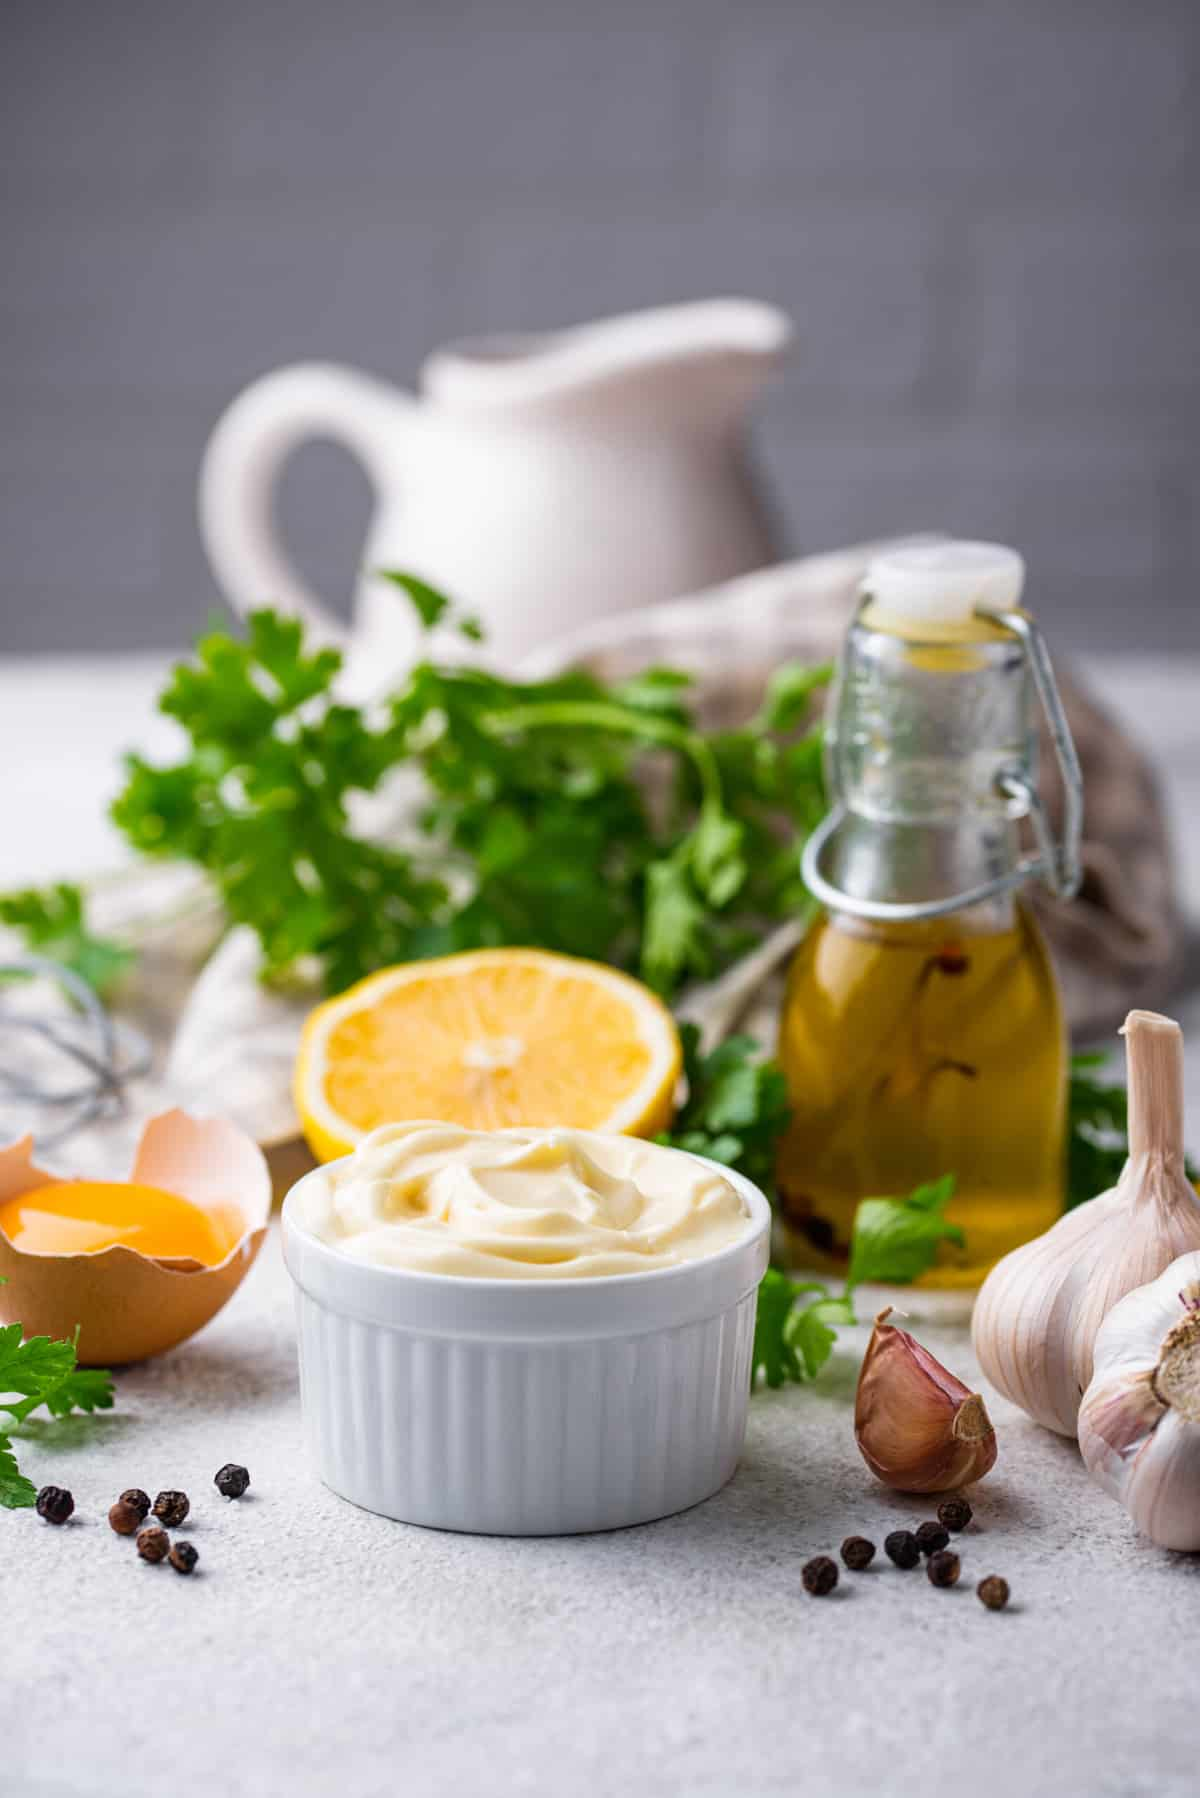 ingredients for a homemade mayonnaise recipe - eggs, garlic, oil, salt, pepper